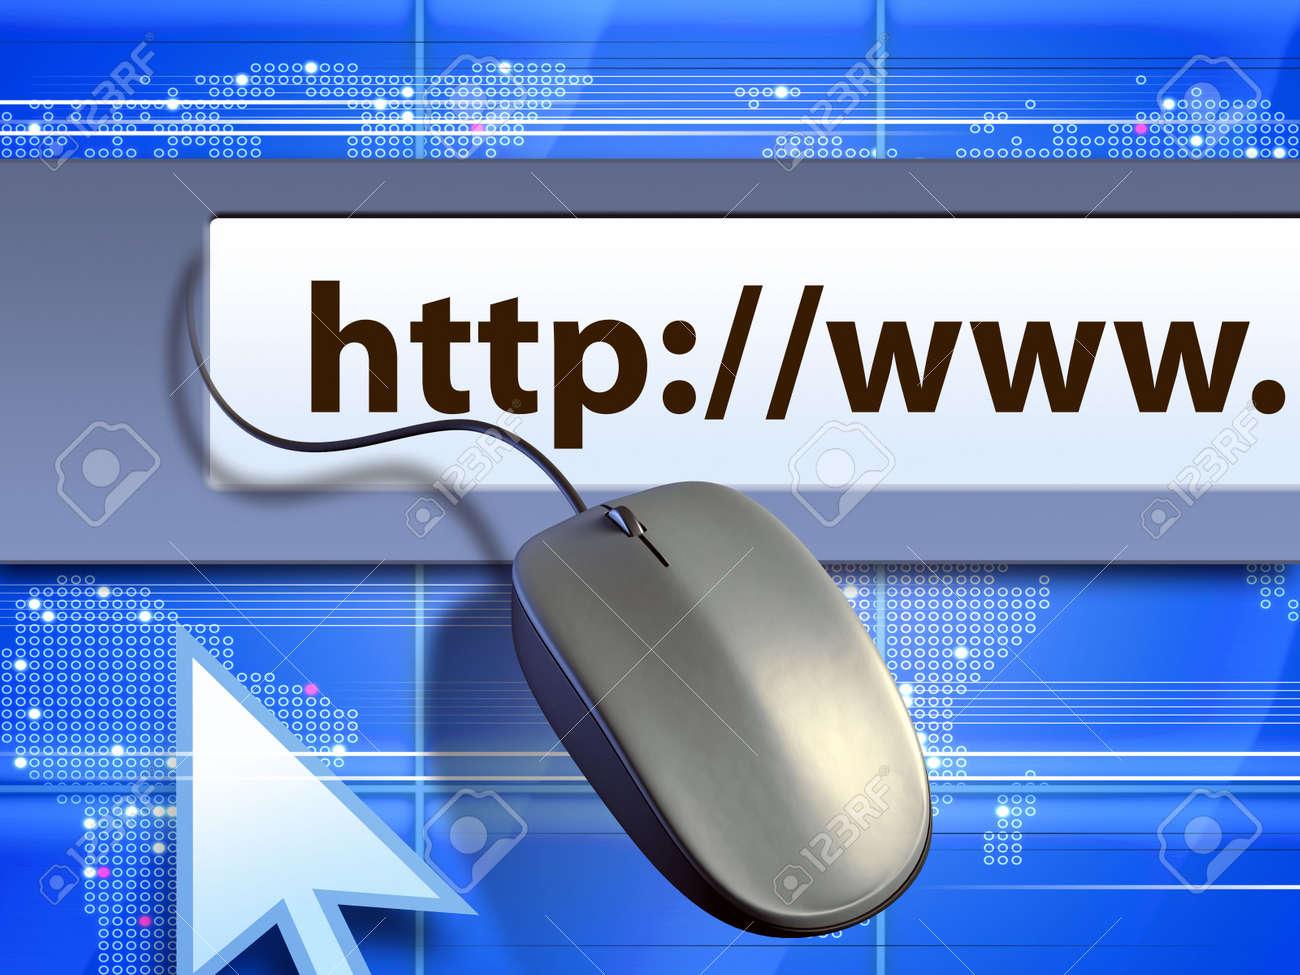 Interface tools used for internet navigation. Digital illustration. Stock Illustration - 4615339